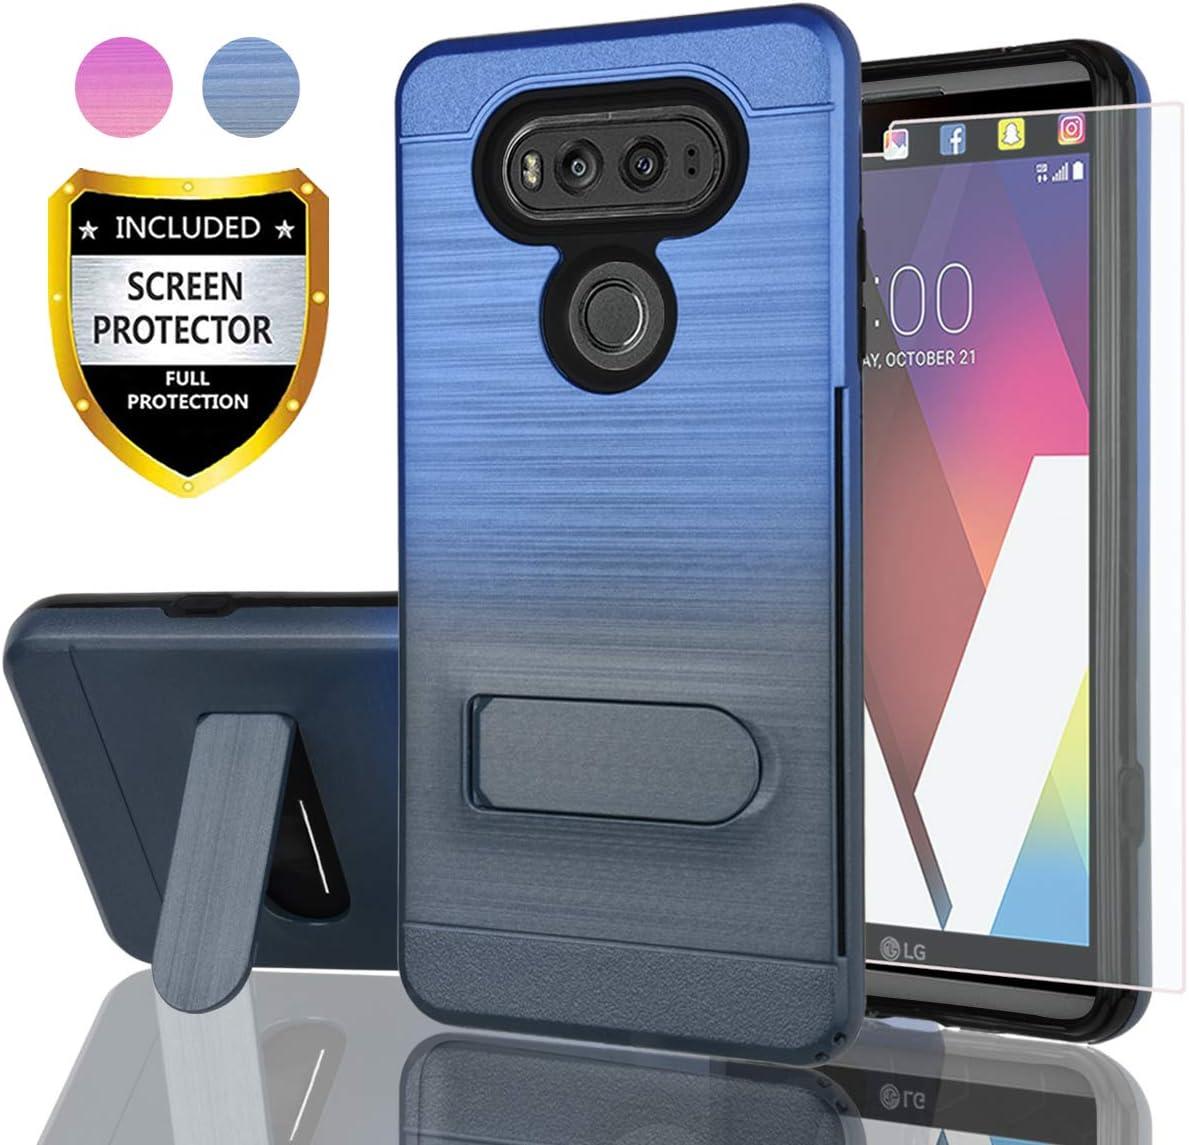 AYMECL LG V20 Case,LG V20 Case with HD Screen Protector,[Card Slots Holder] Plastic TPU Hybrid Gradient Color Shockproof Case for LG V20-GC Blue&Cyan-1